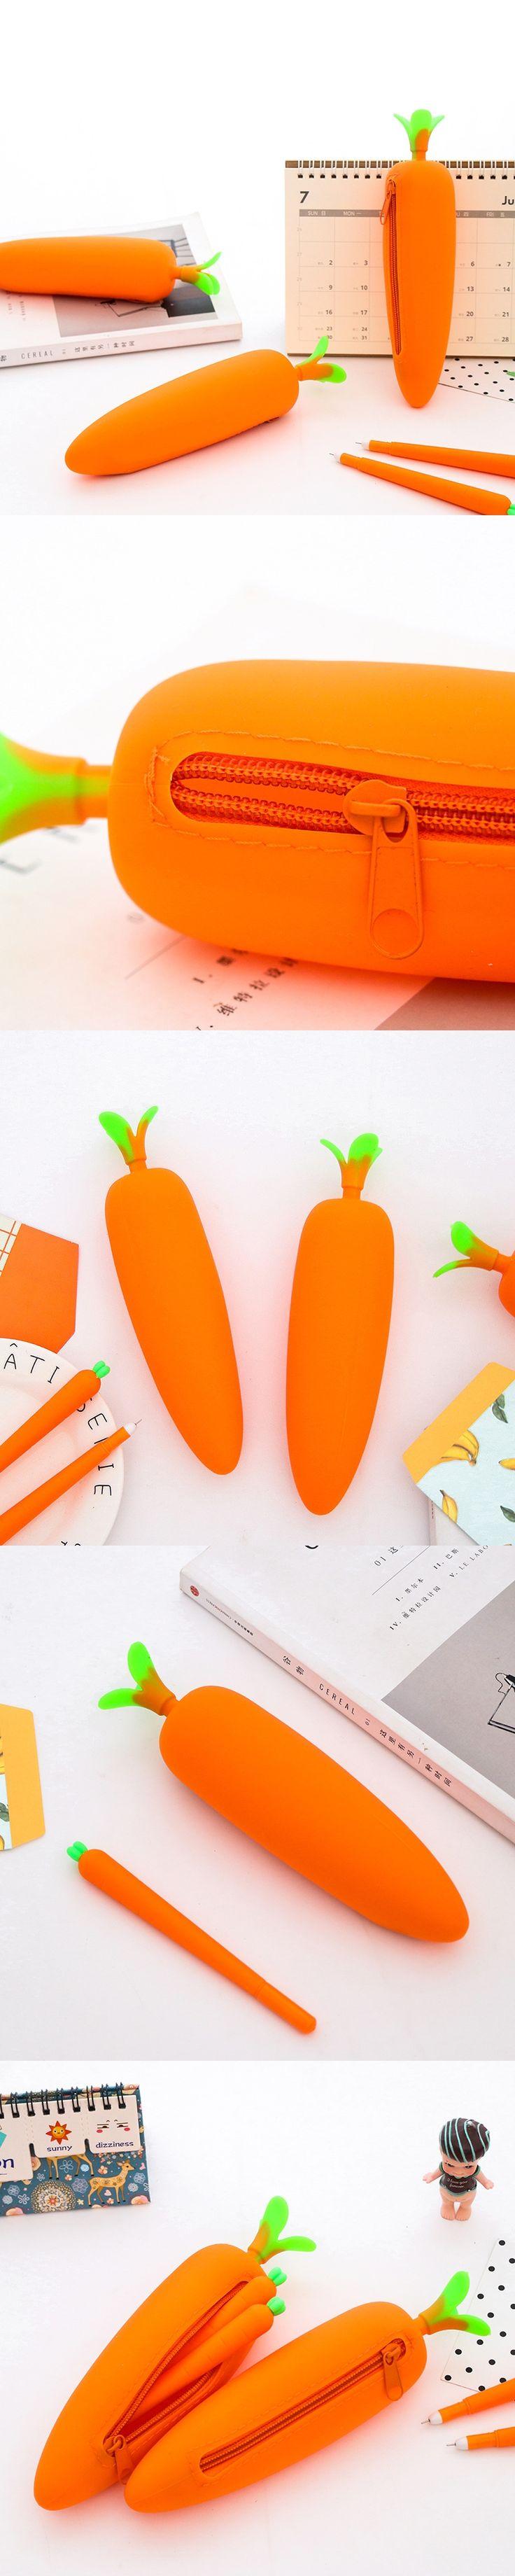 New Korean Style Cute Carrot Pencil Bag Stationery Storage Organizer Bag Boys&Girls Pencil Case For School Supplies